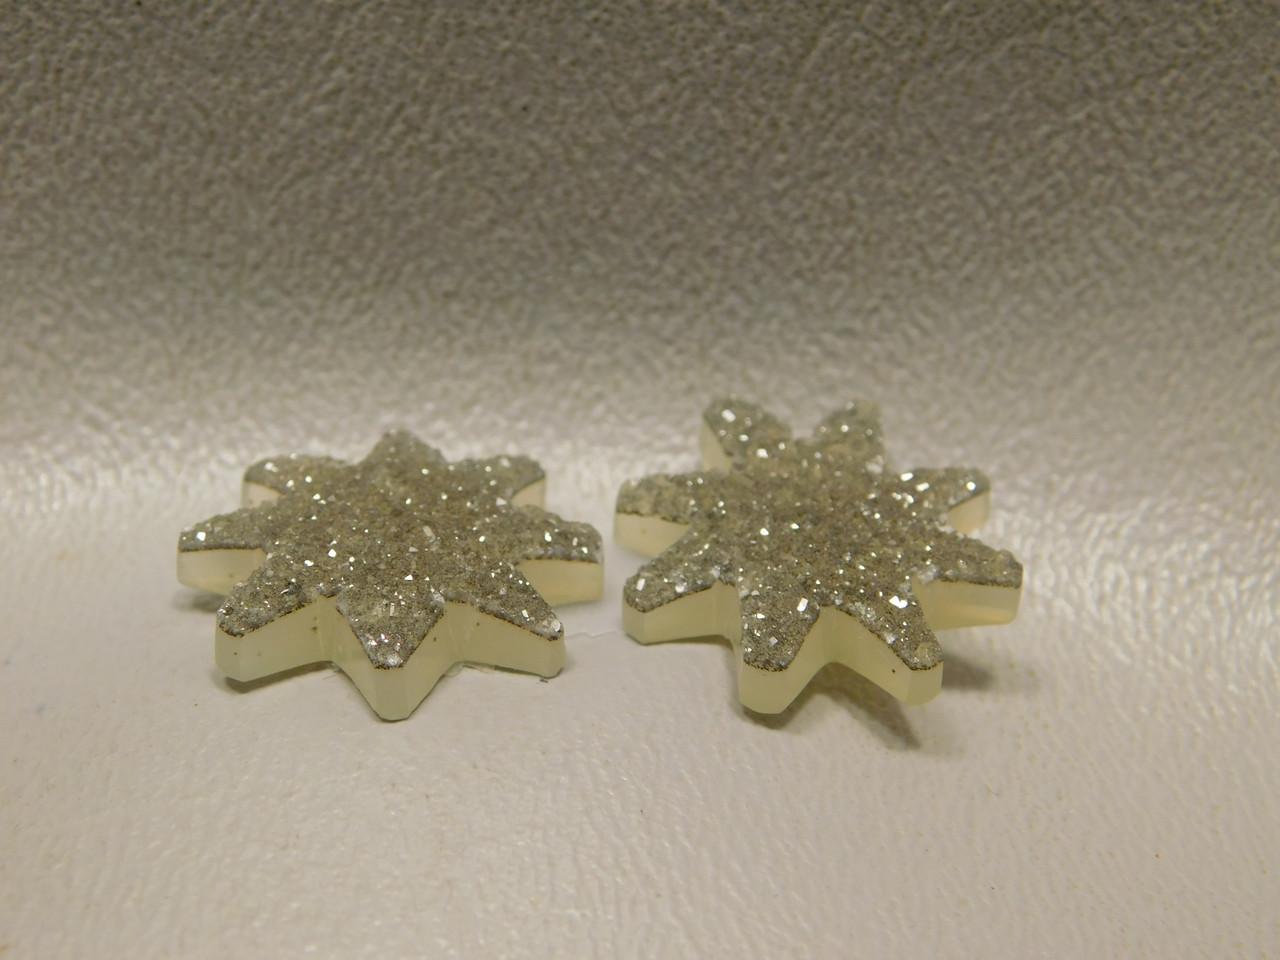 Agate Drusy Druse Crystal 23 mm Custom Cut Star Cabochons Pair #7